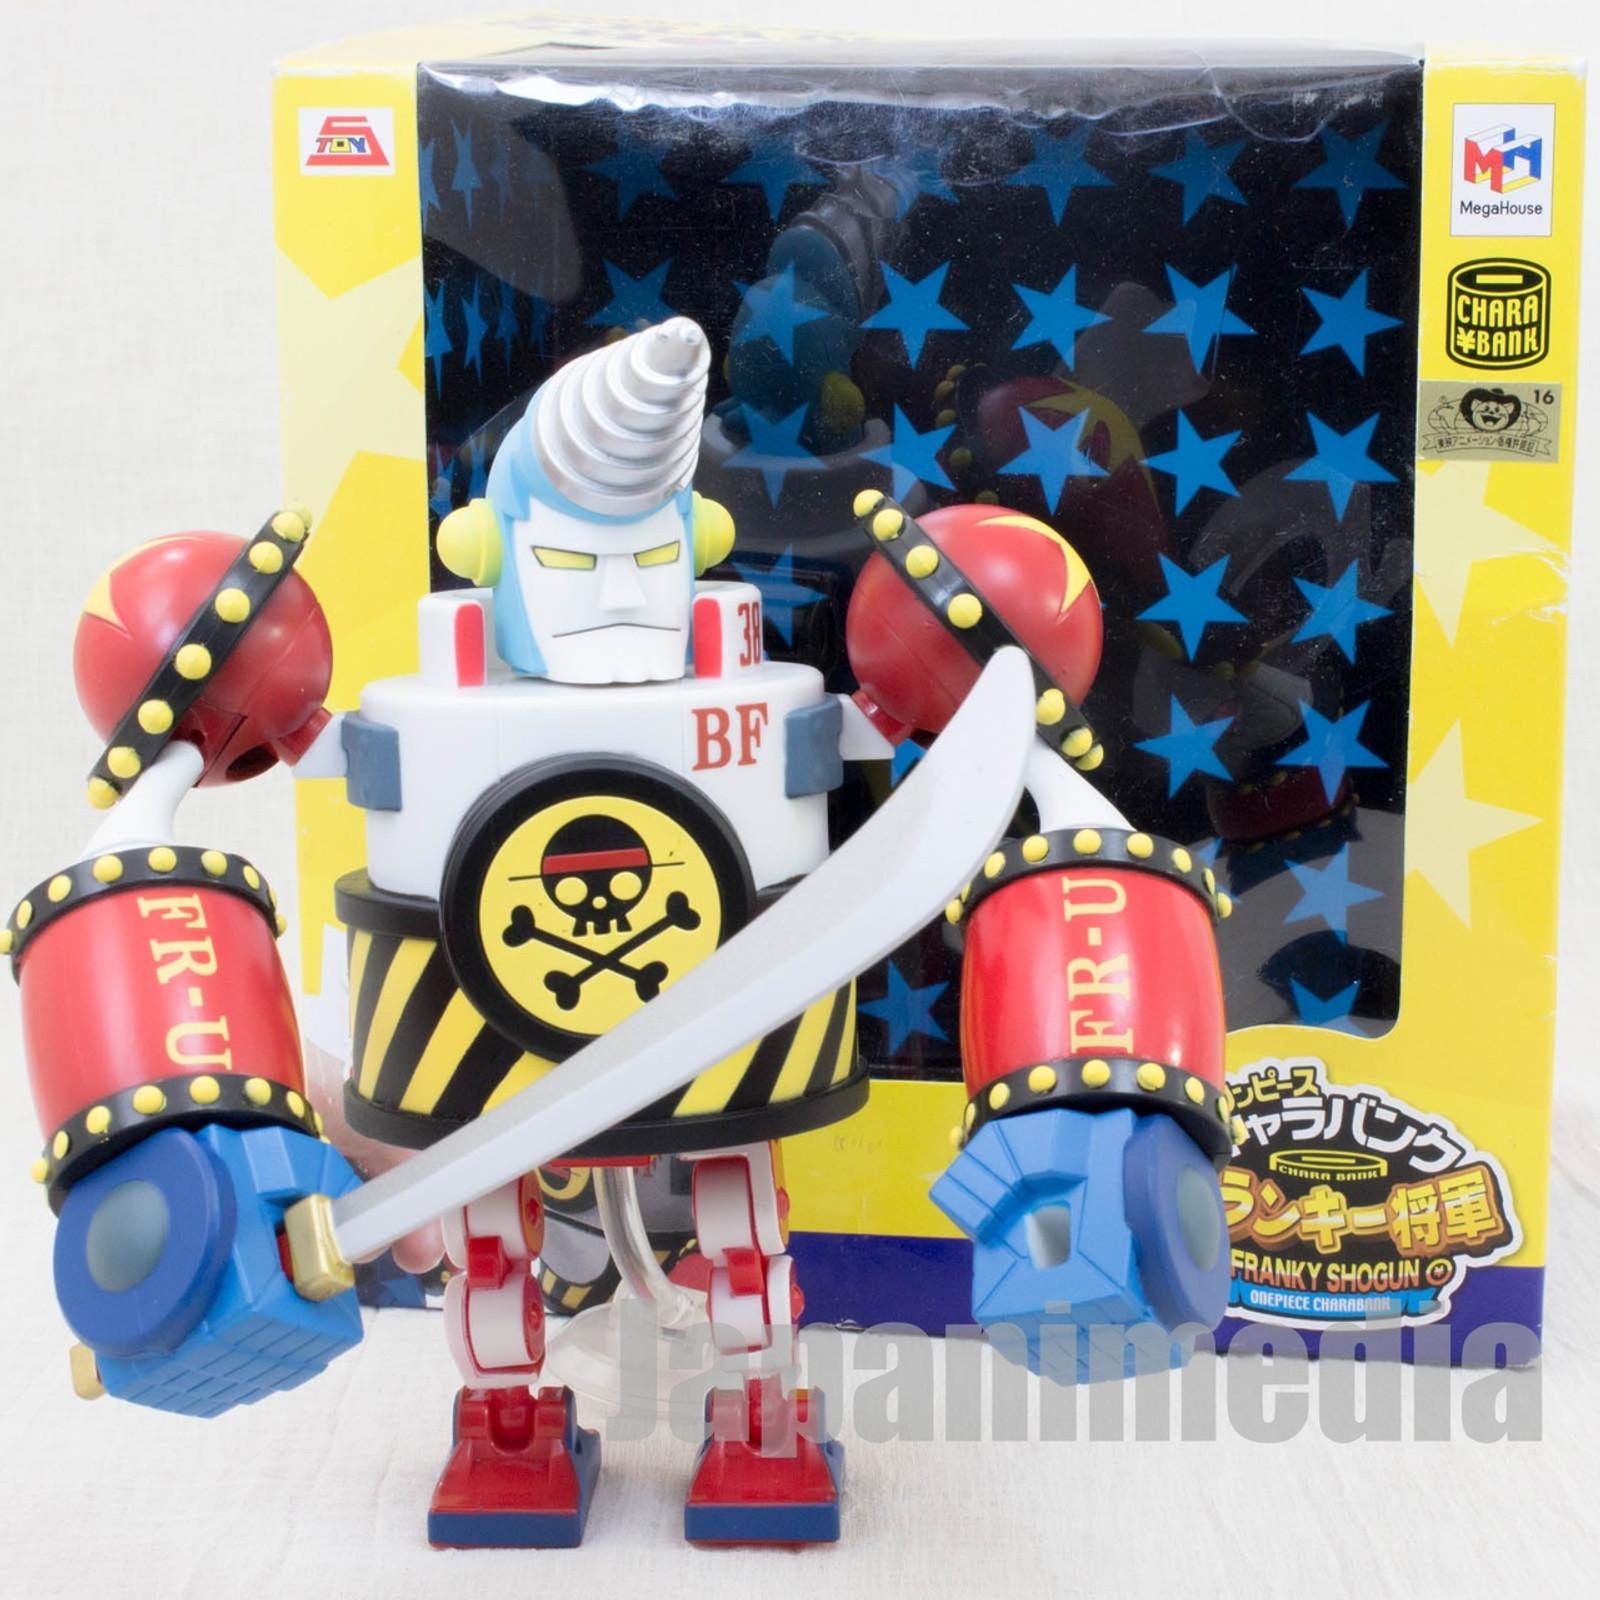 RARE! One Piece Chara Bank Franky Shogun Action Figure Megahouse JAPAN ANIME